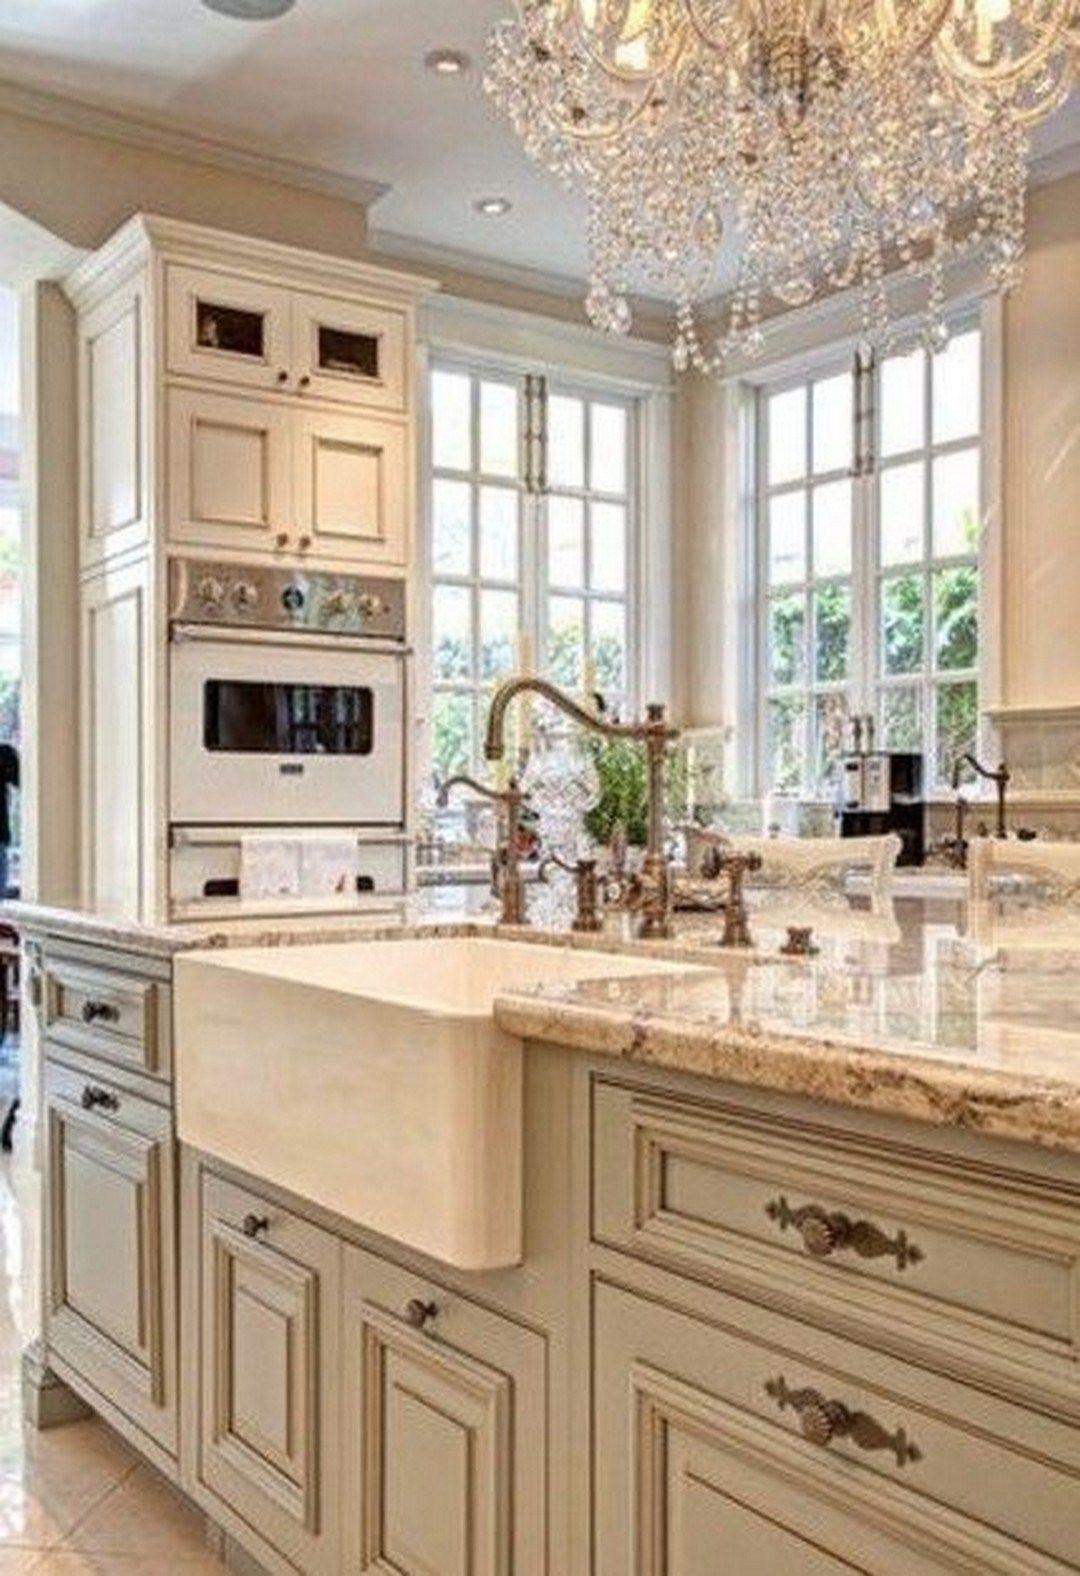 luxury and elegant kitchen design inspiration 25 country kitchen designs country kitchen on kitchen ideas elegant id=44158